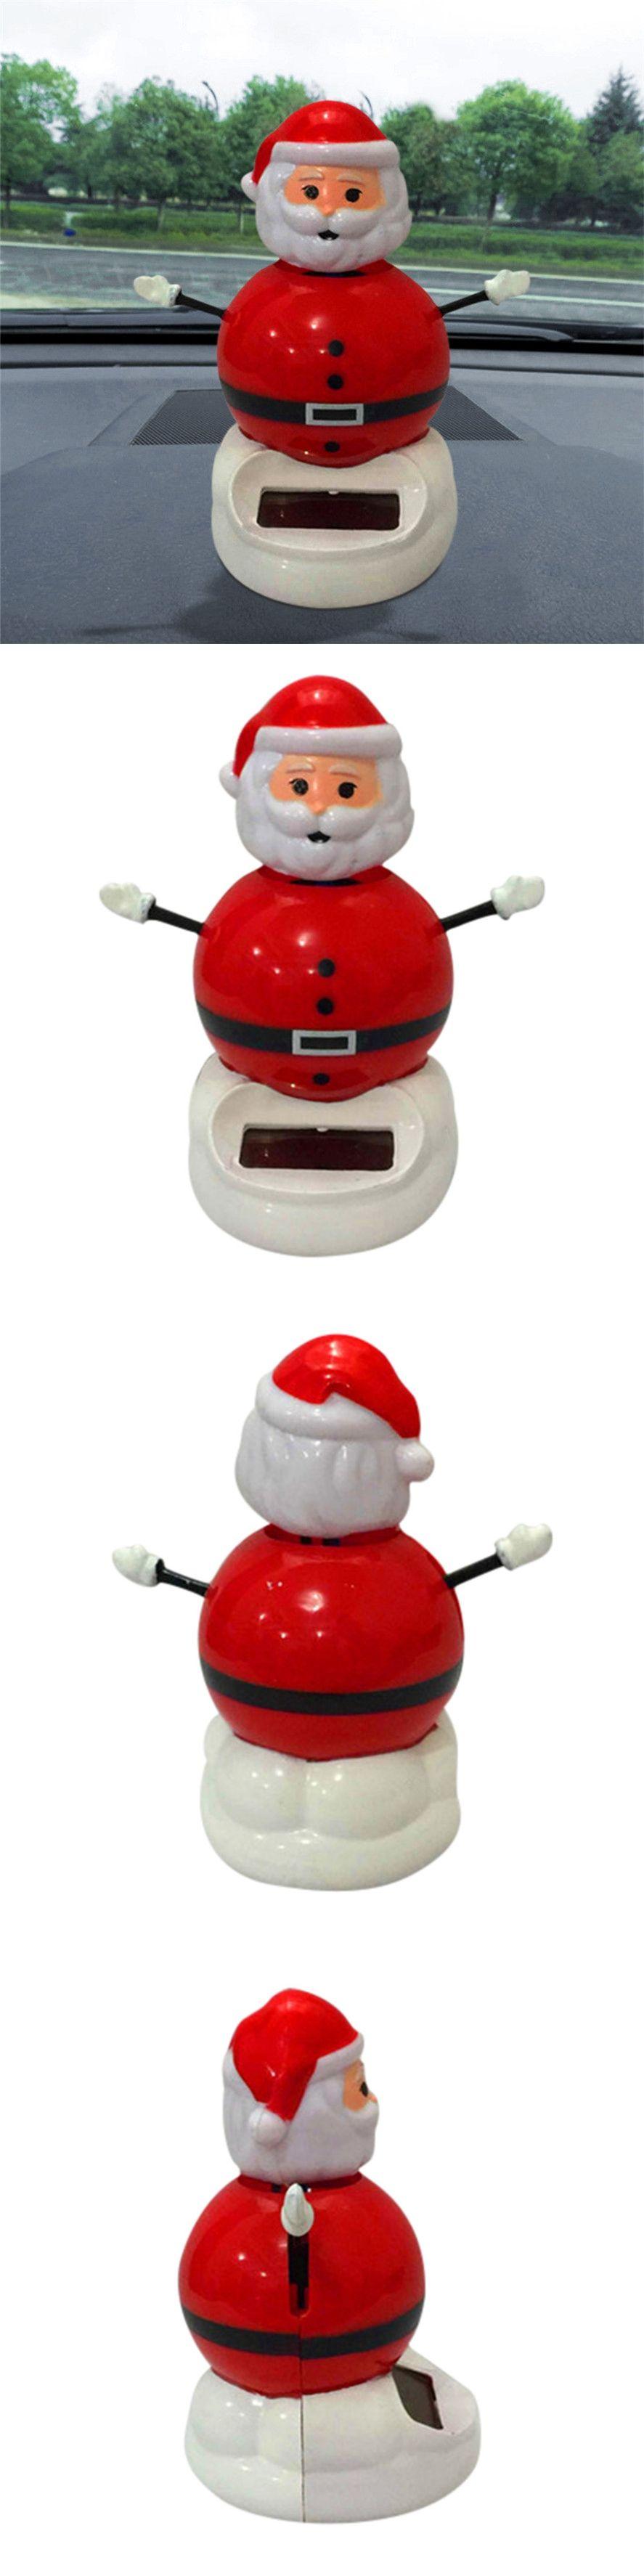 Car dashboard accessories toys  CARPRIE PC Christmas Car Inner Decor Solar Powered Dancing Swinging